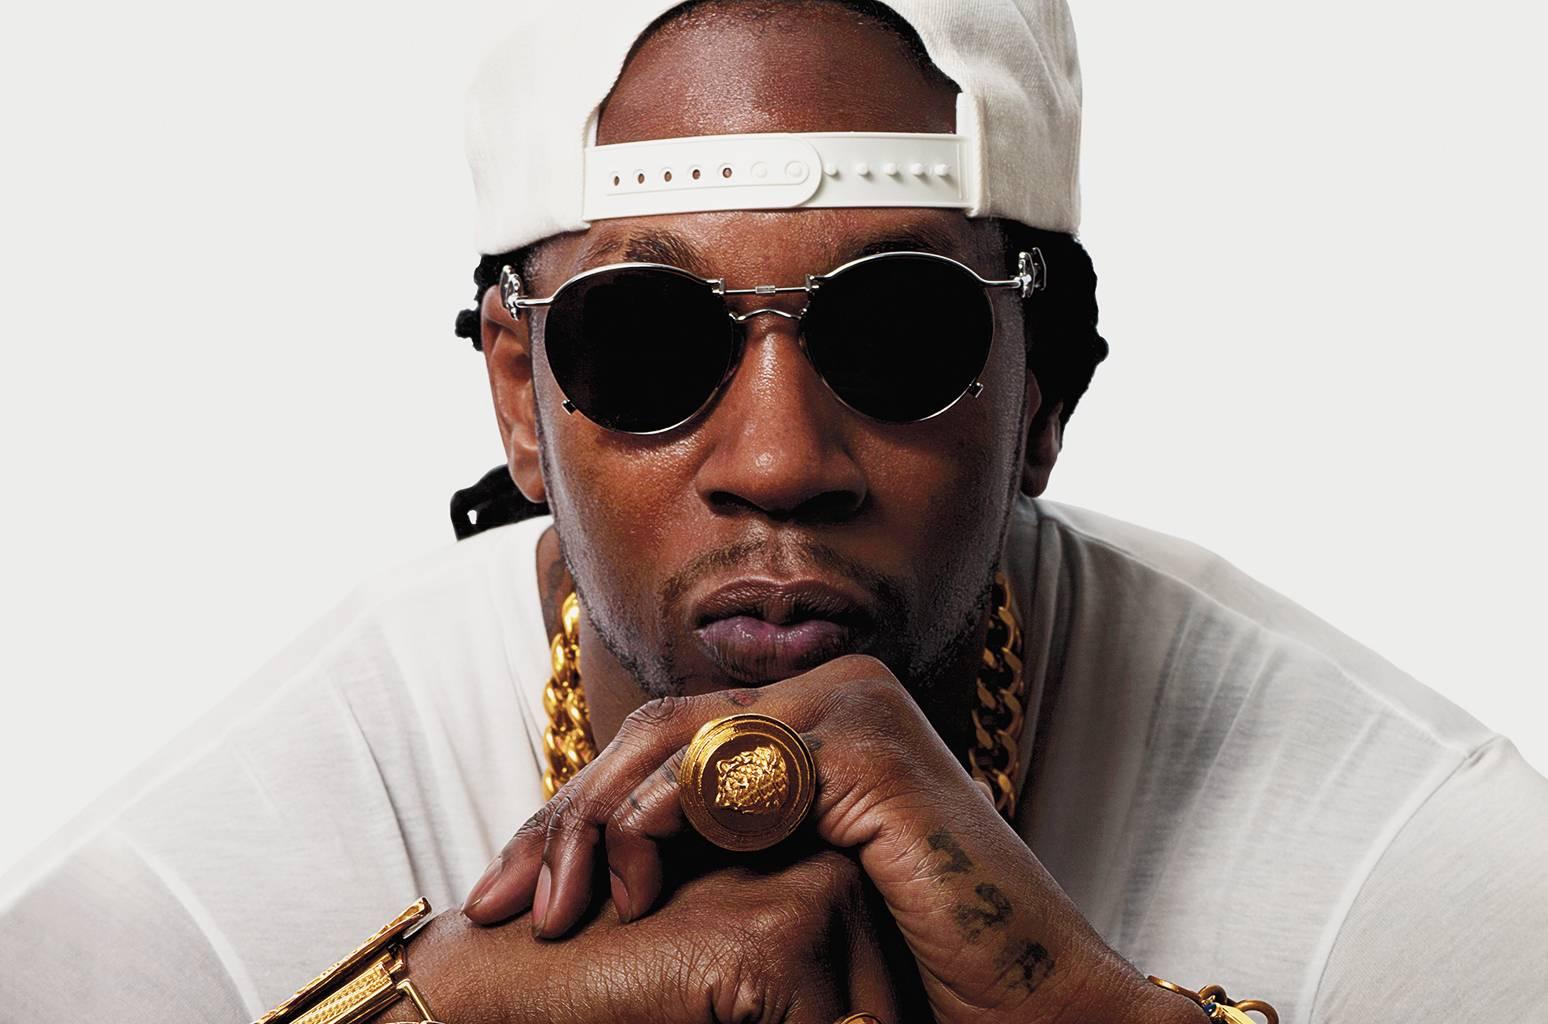 TOP 10 nejlepších rapových alb roku 2017: Kendrick Lamar, Jay-Z, 2 Chainz i Drake